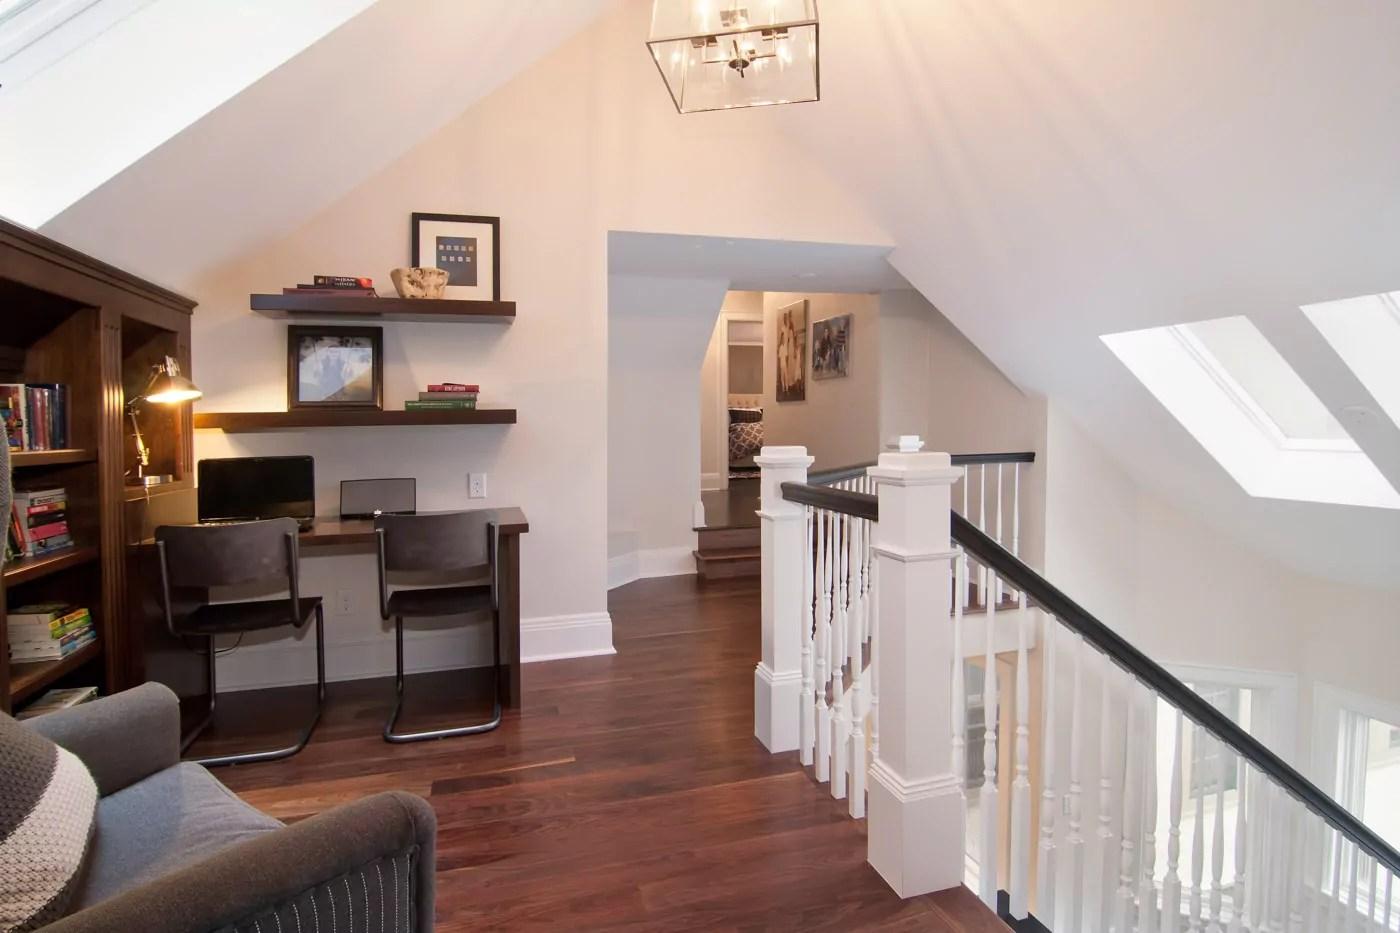 Interior Home Remodeling Portfolio  James Barton DesignBuild